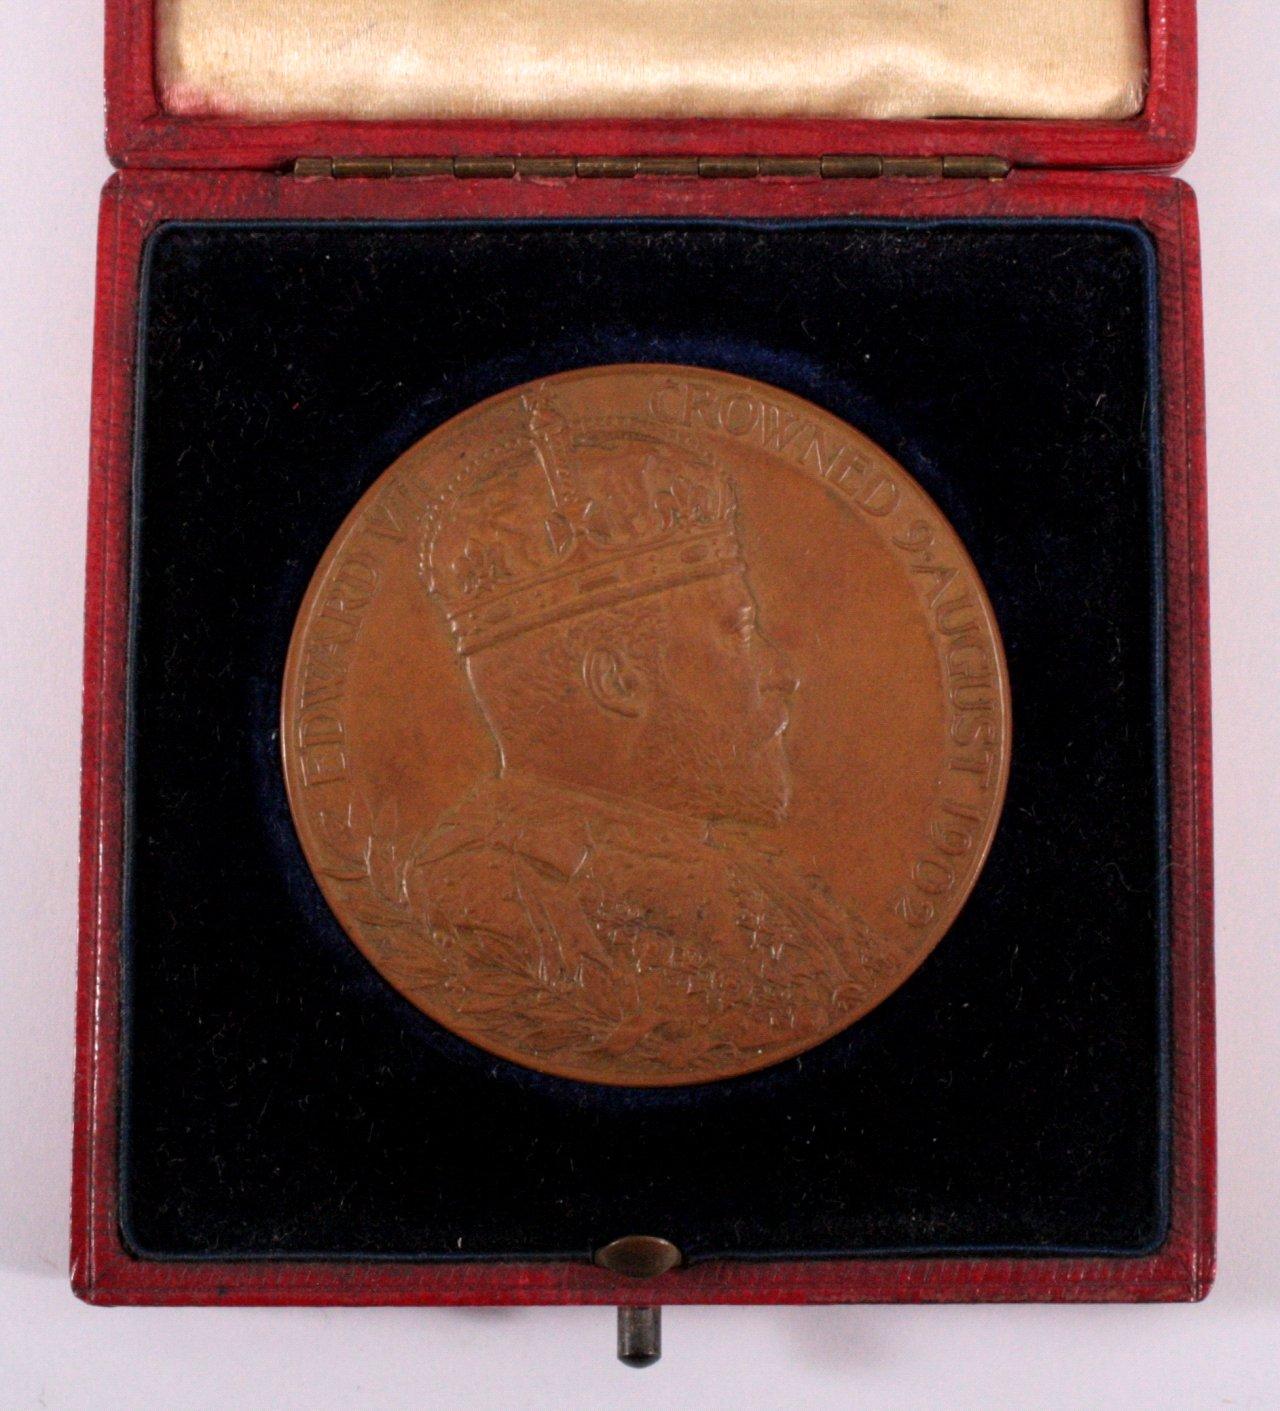 Offizielle Krönungsmedaille Edward VII 1902